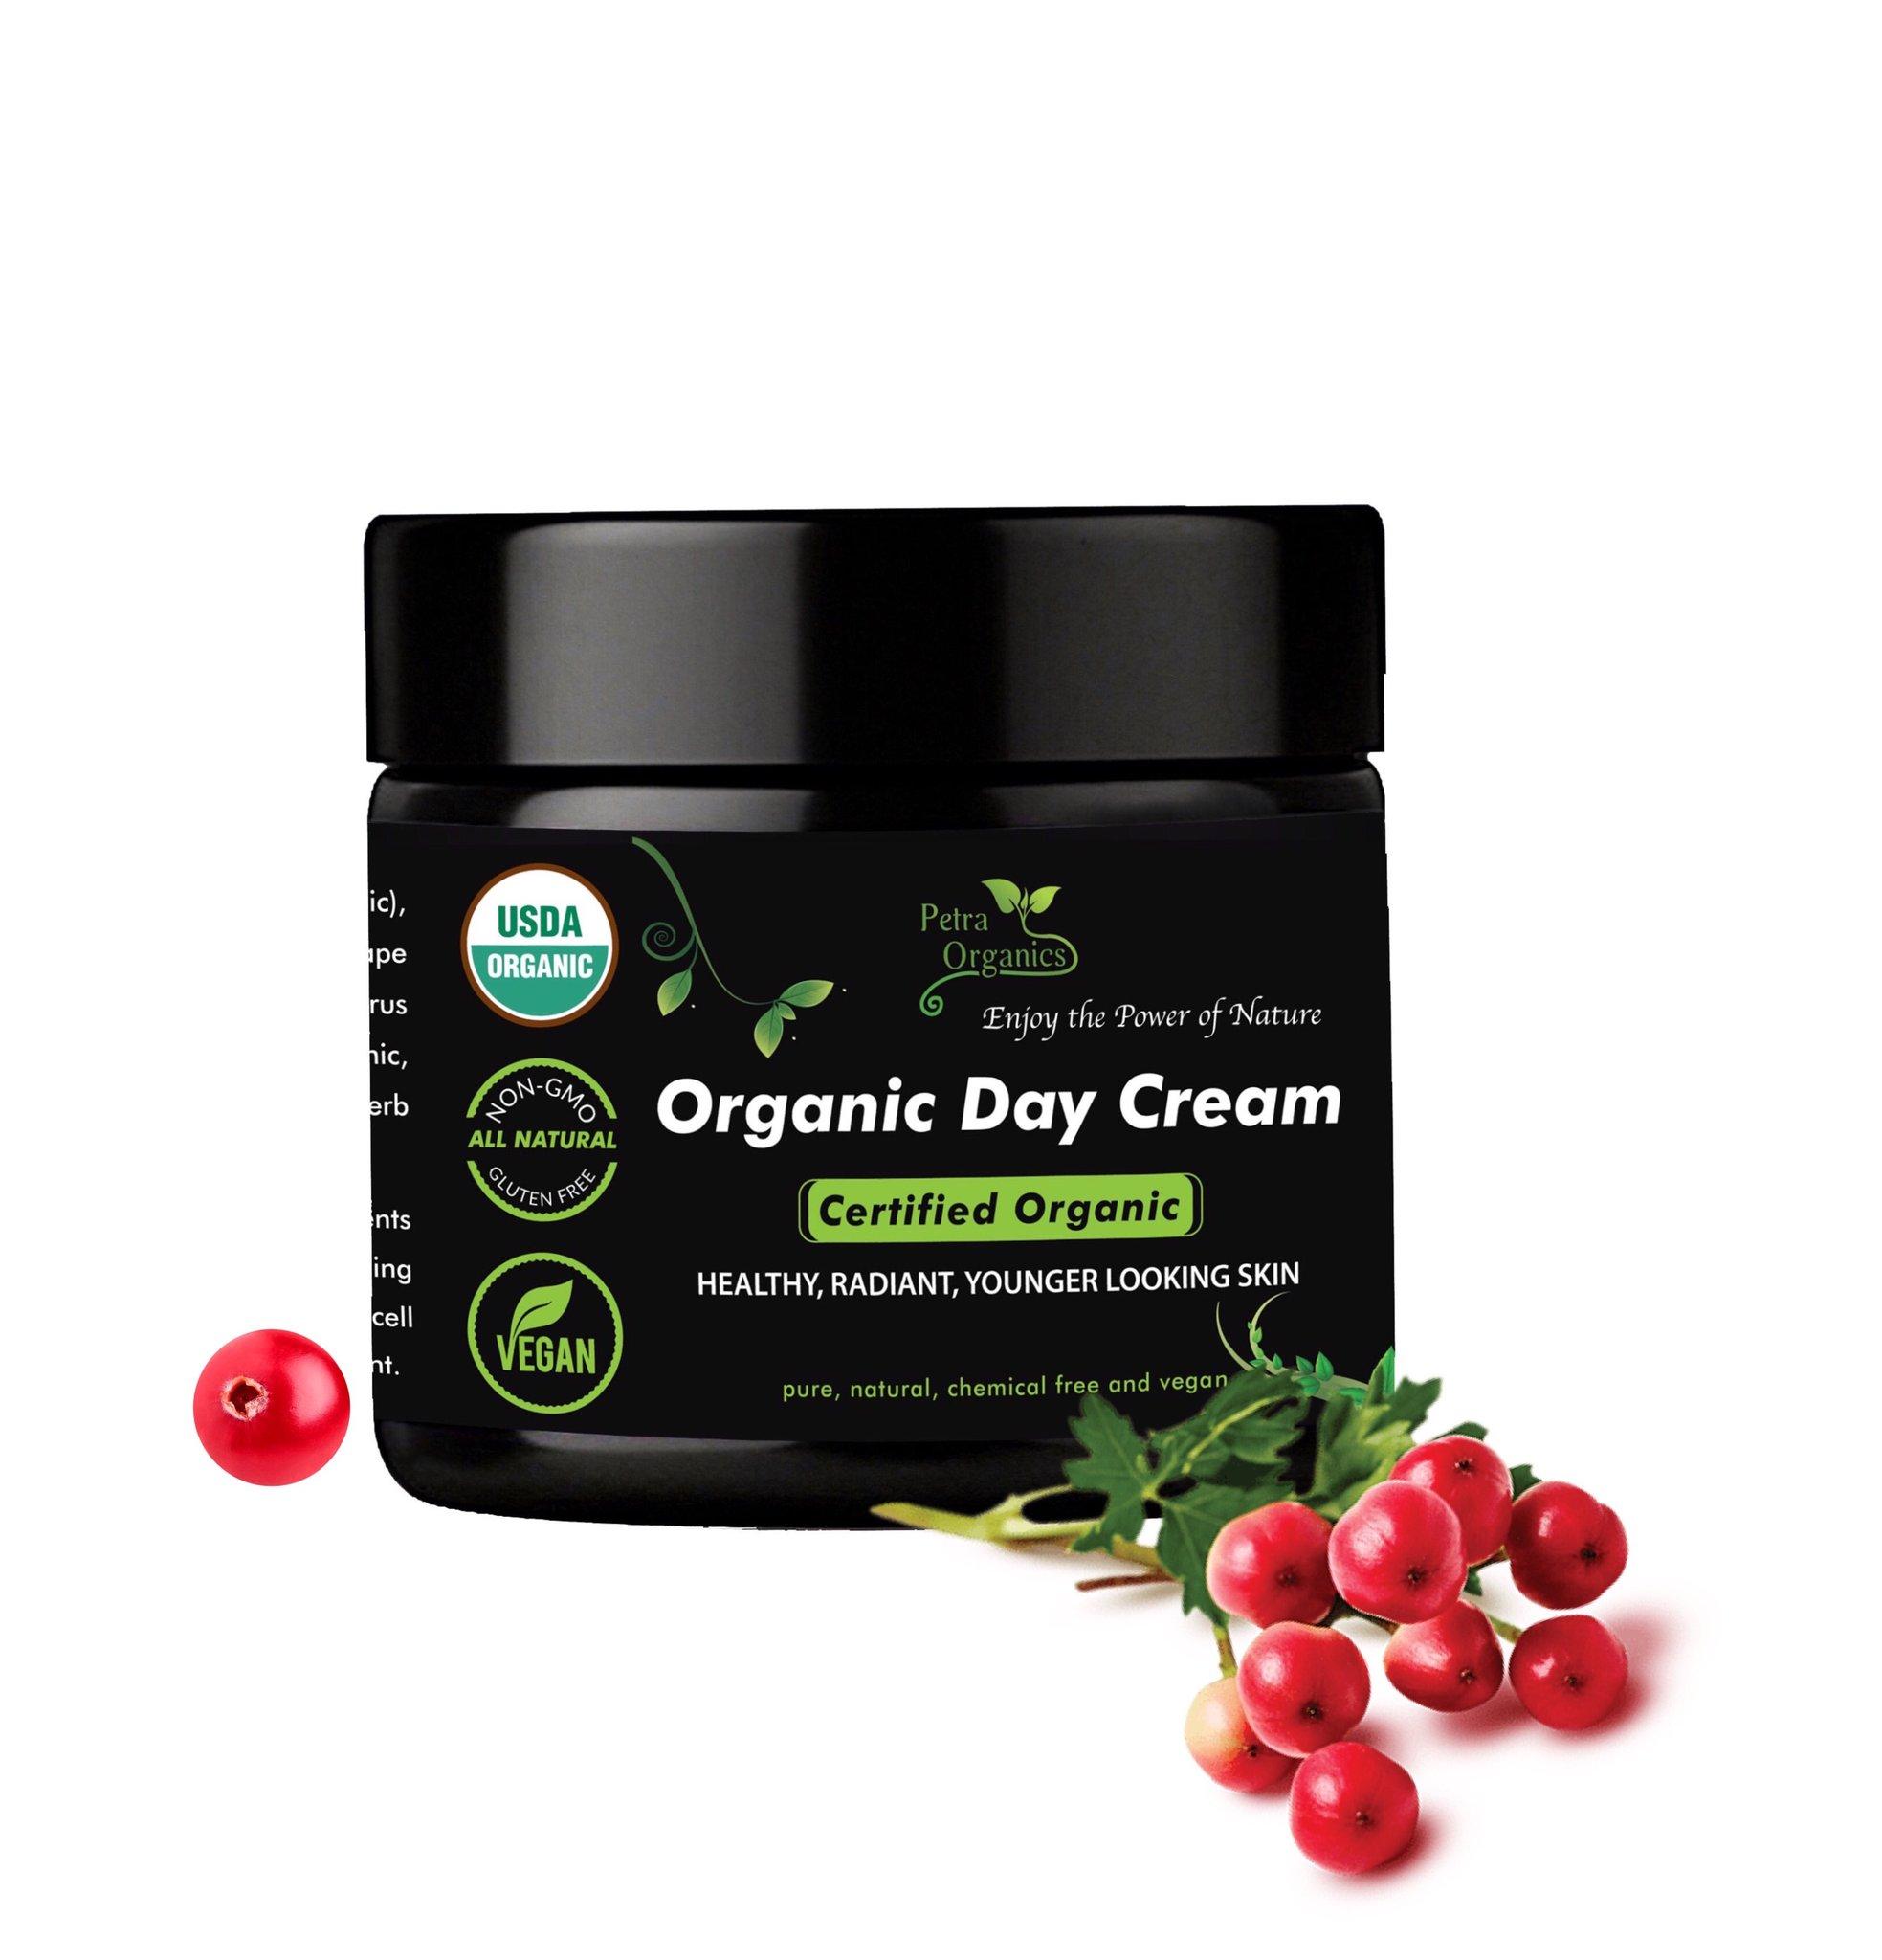 Organic Day Cream